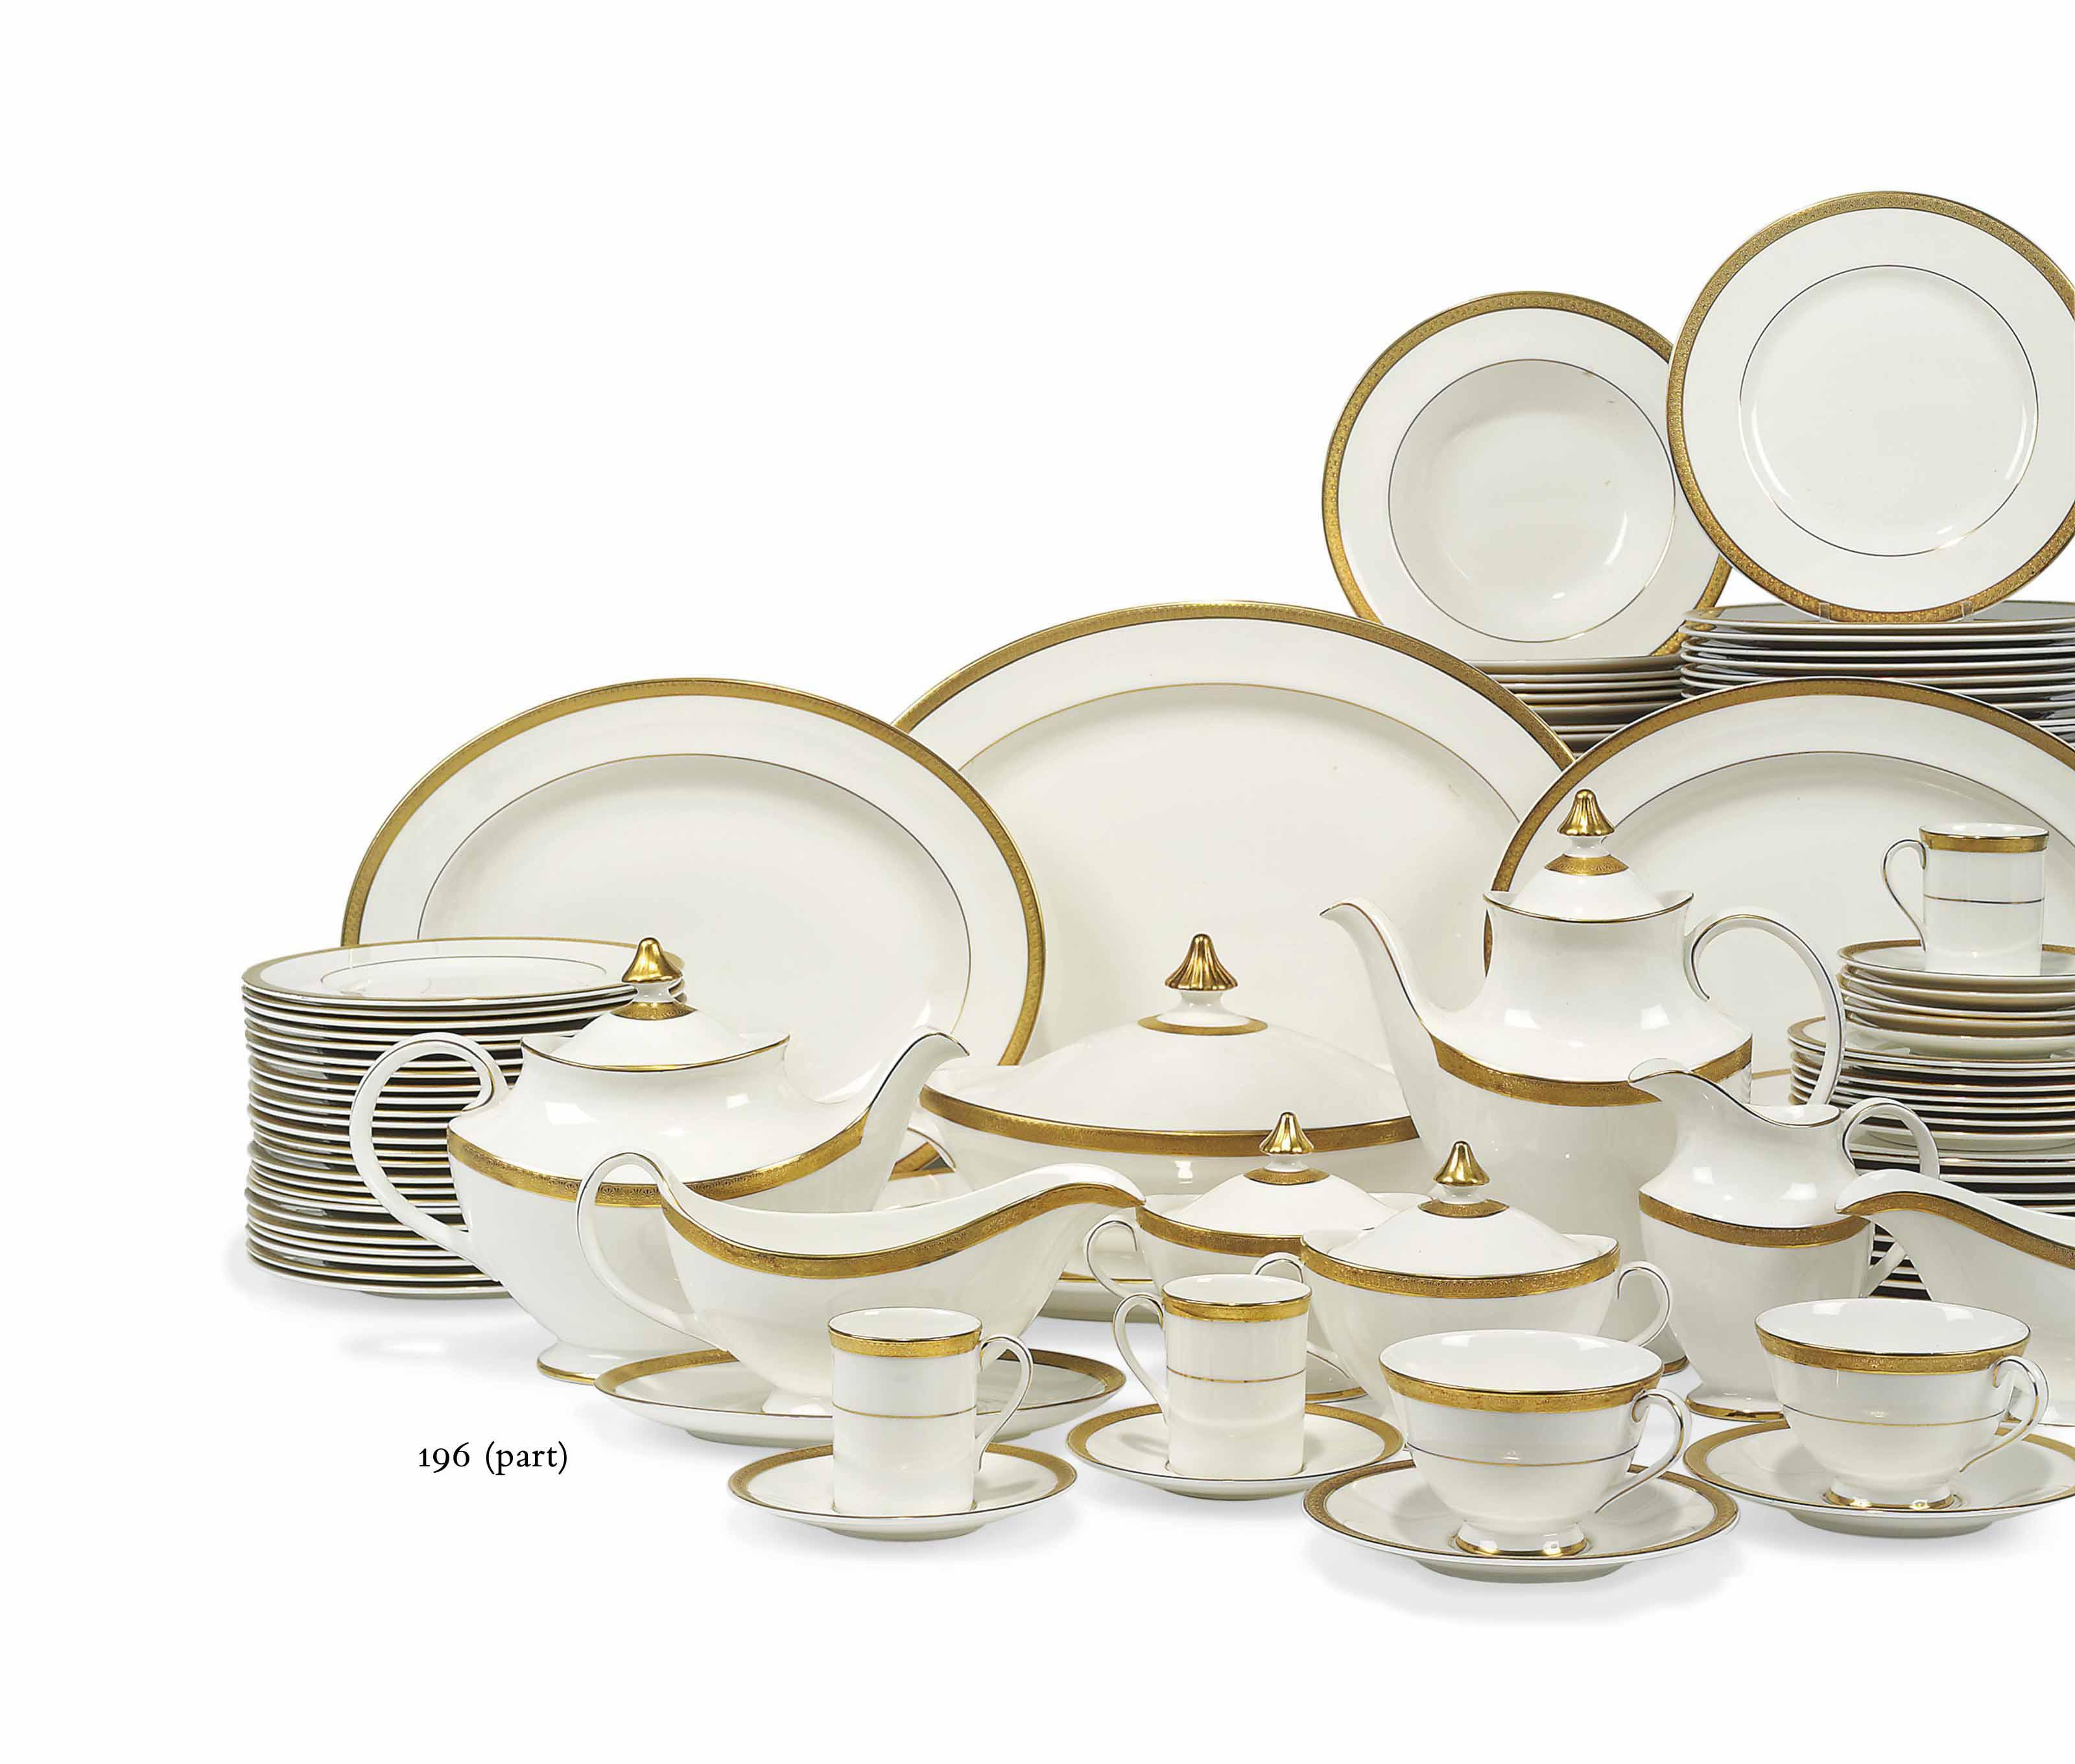 A ROYAL DOULTON 'ROYAL GOLD' PATTERN PART TABLE-SERVICE